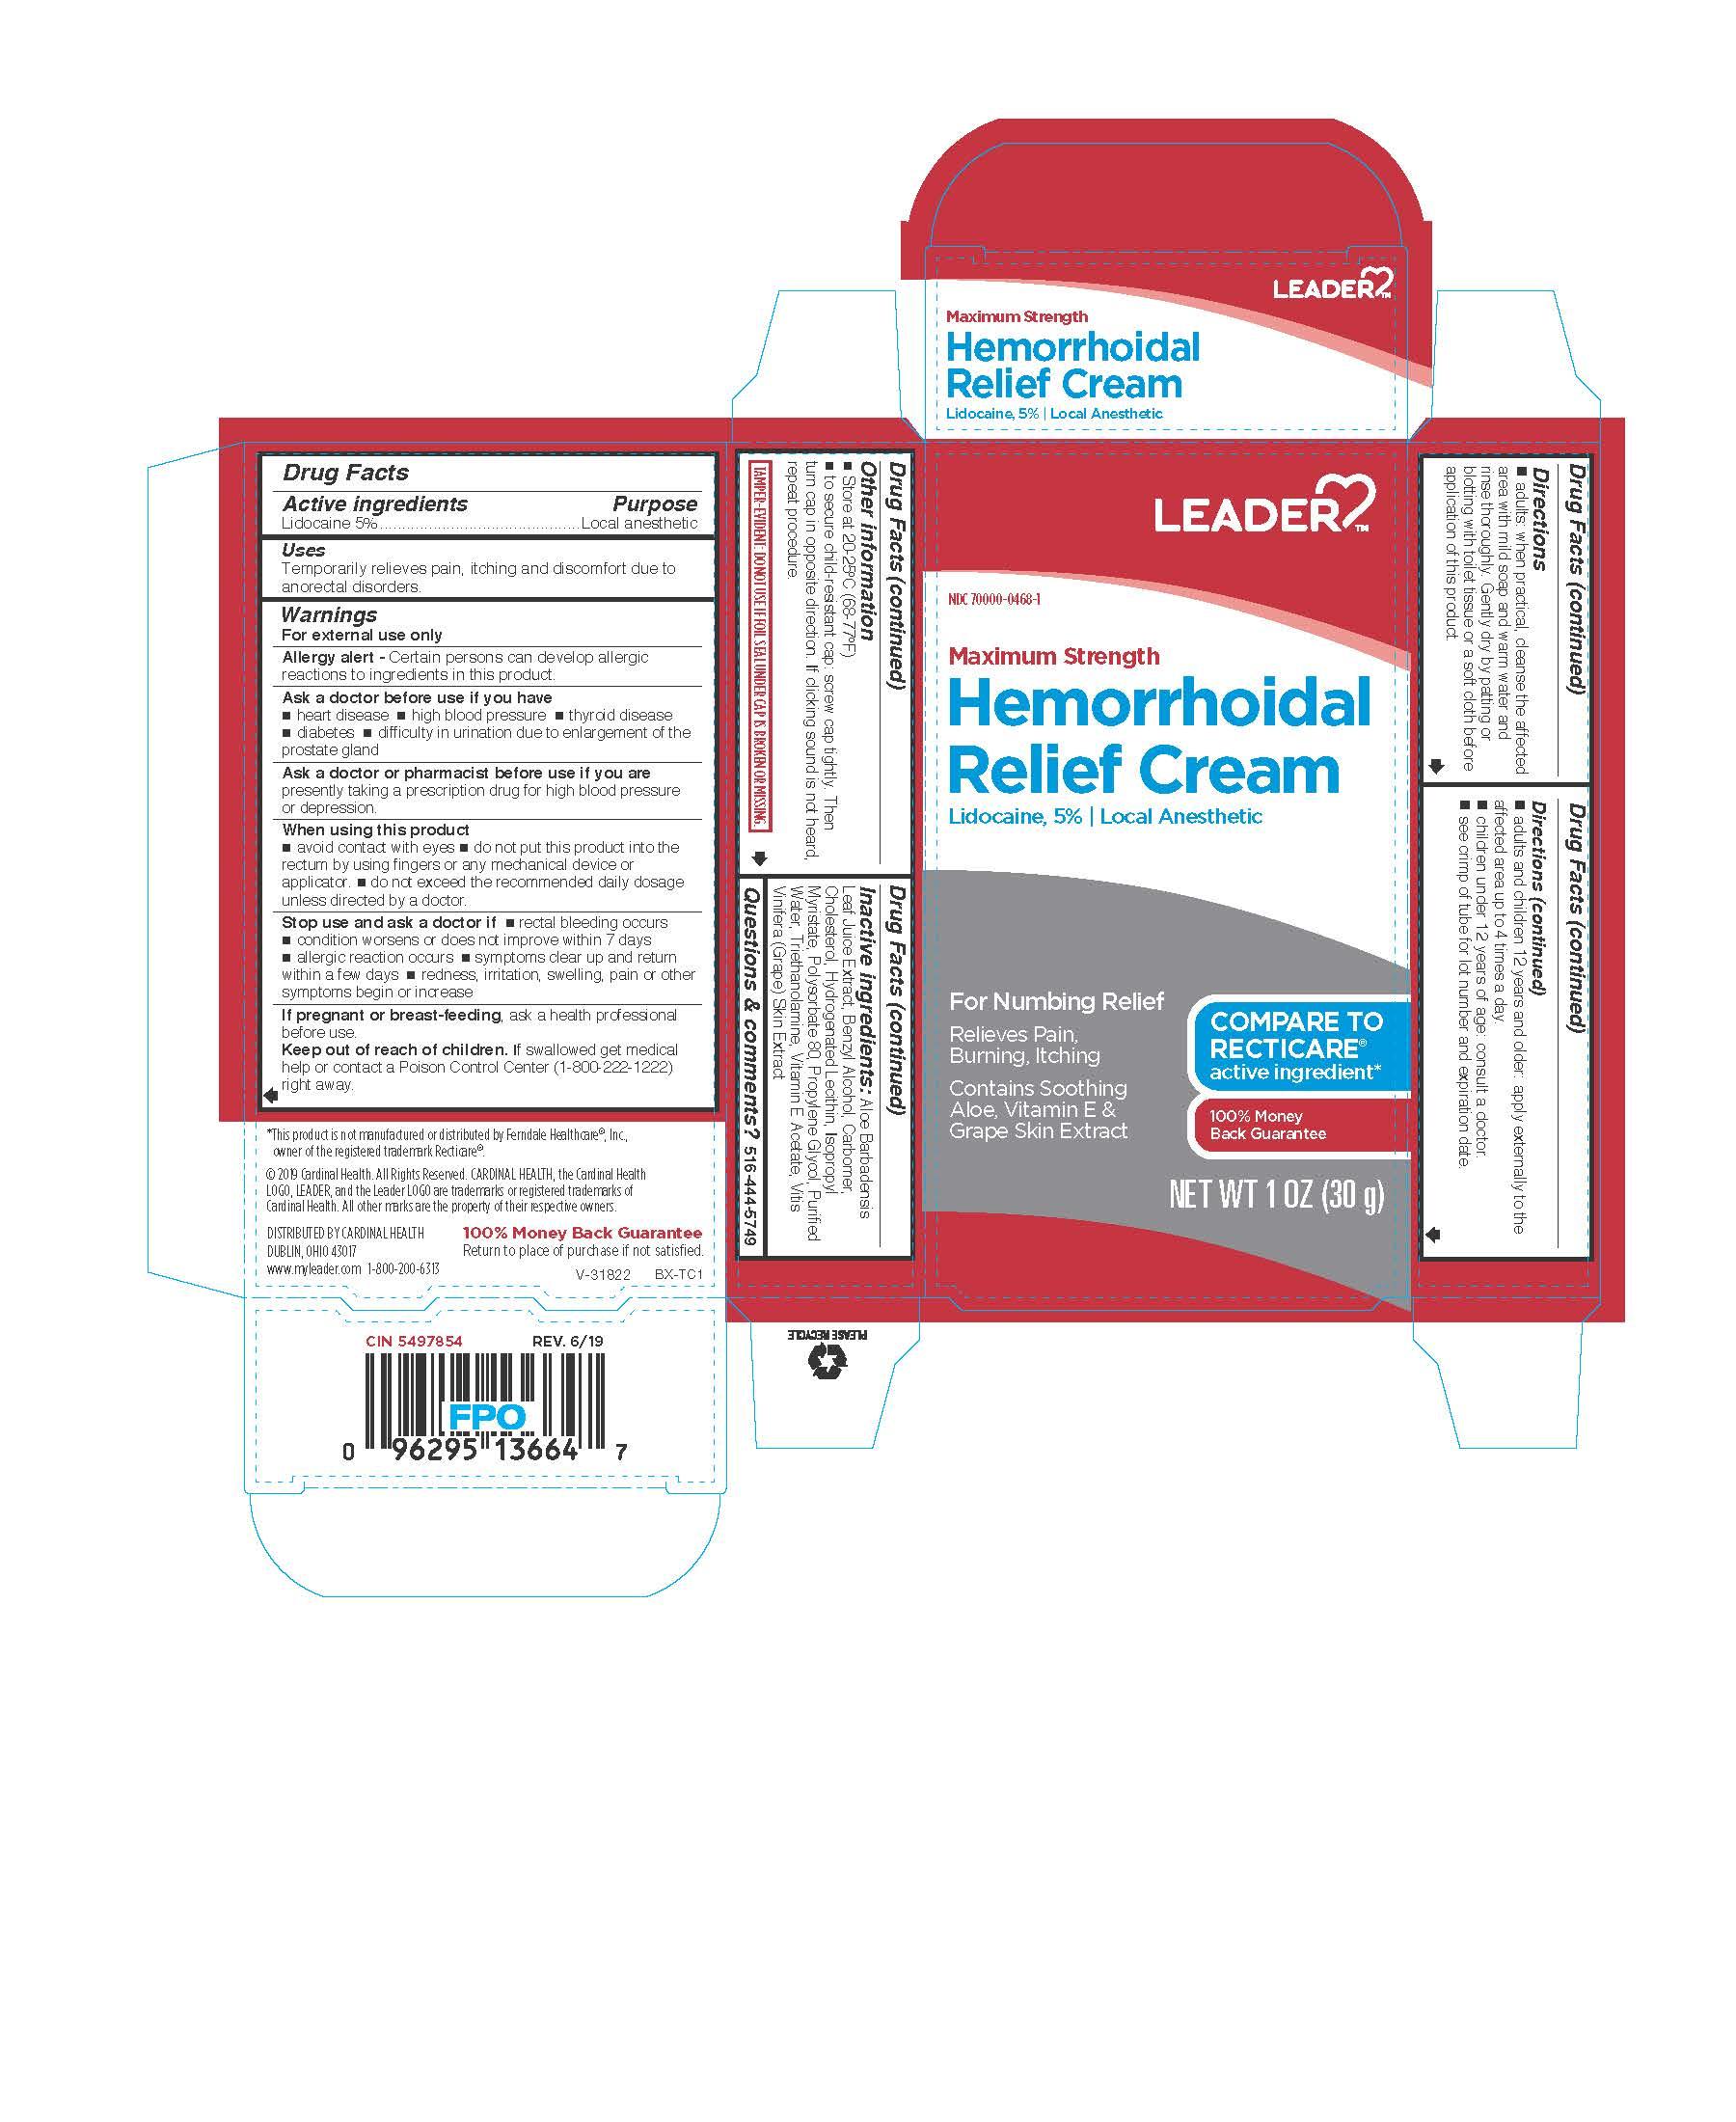 Lidocaine (Hemorrhoidal Relief Cream)